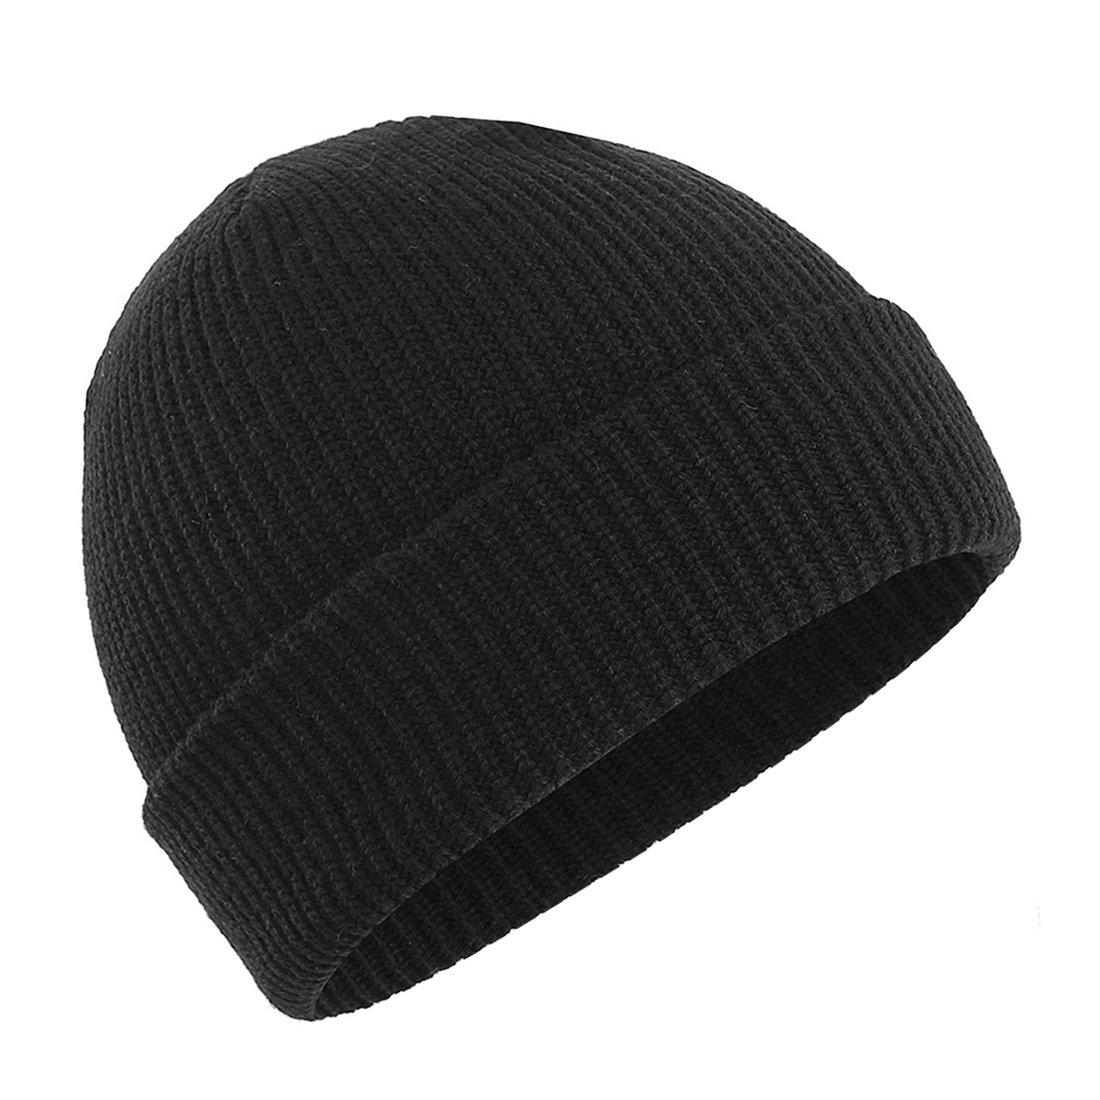 8bd16bcb0ae Amazon.com  Man s or Woman s Winter Warm Knitting Hats Unisex Beanie Cap  Daily Beanie Hat (Black)  Clothing